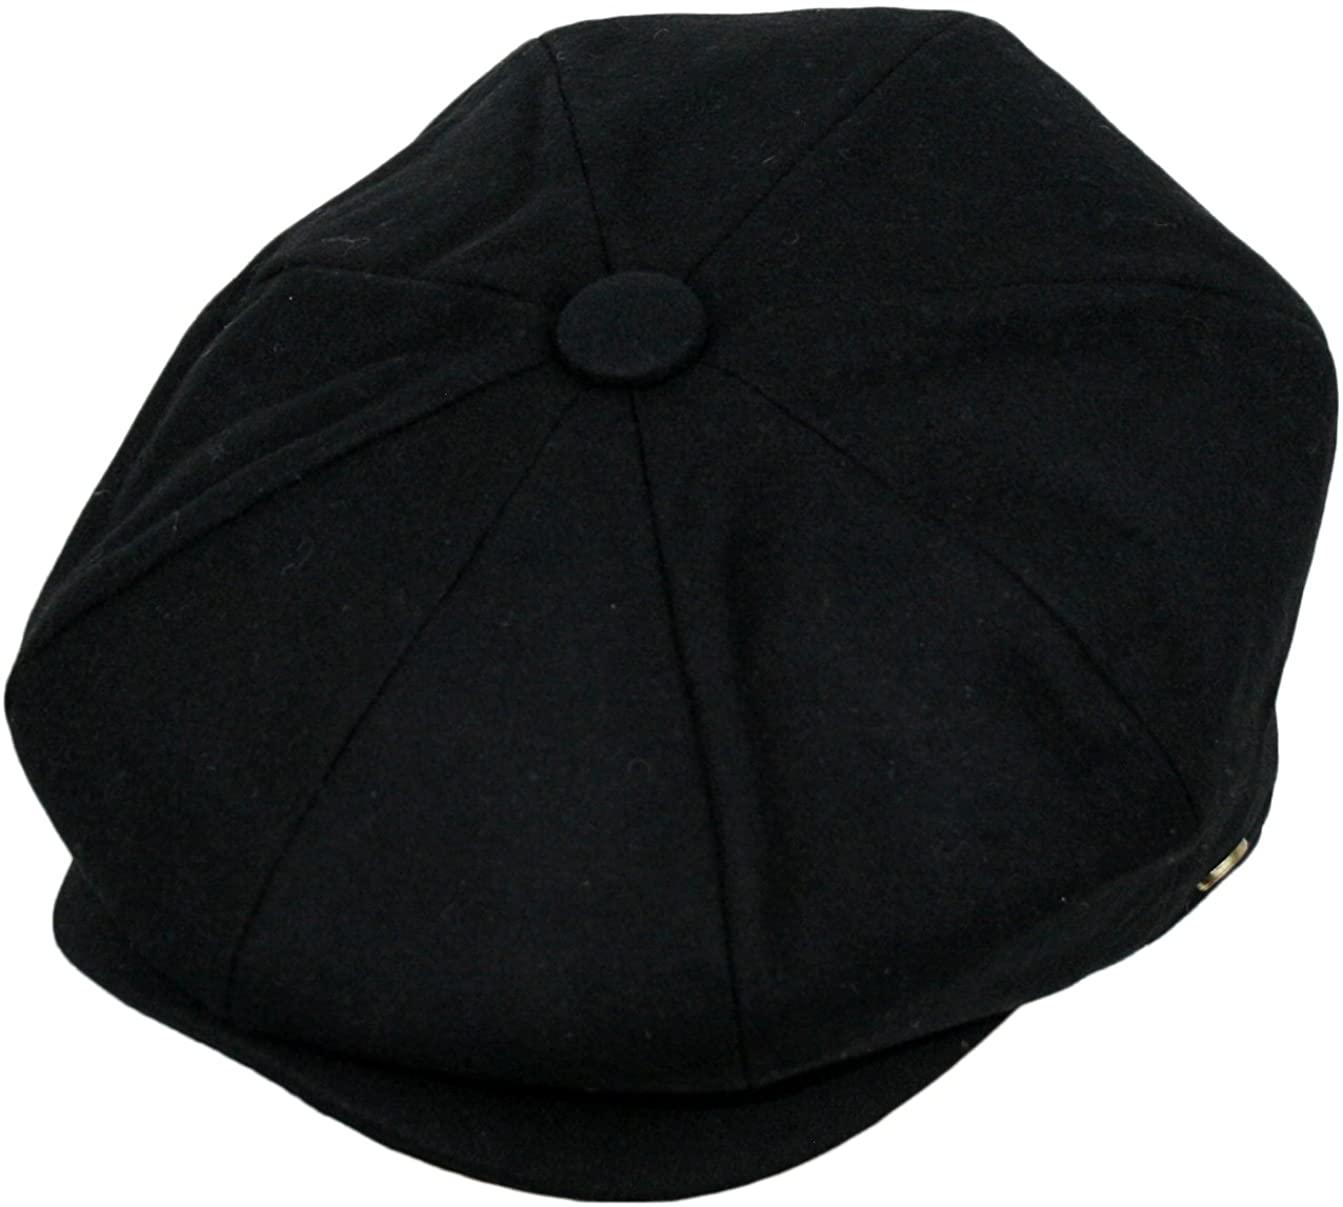 Epoch Men's Classic 8 Panel Wool Blend newsboy Snap Brim Collection Hat, Black, X-Large